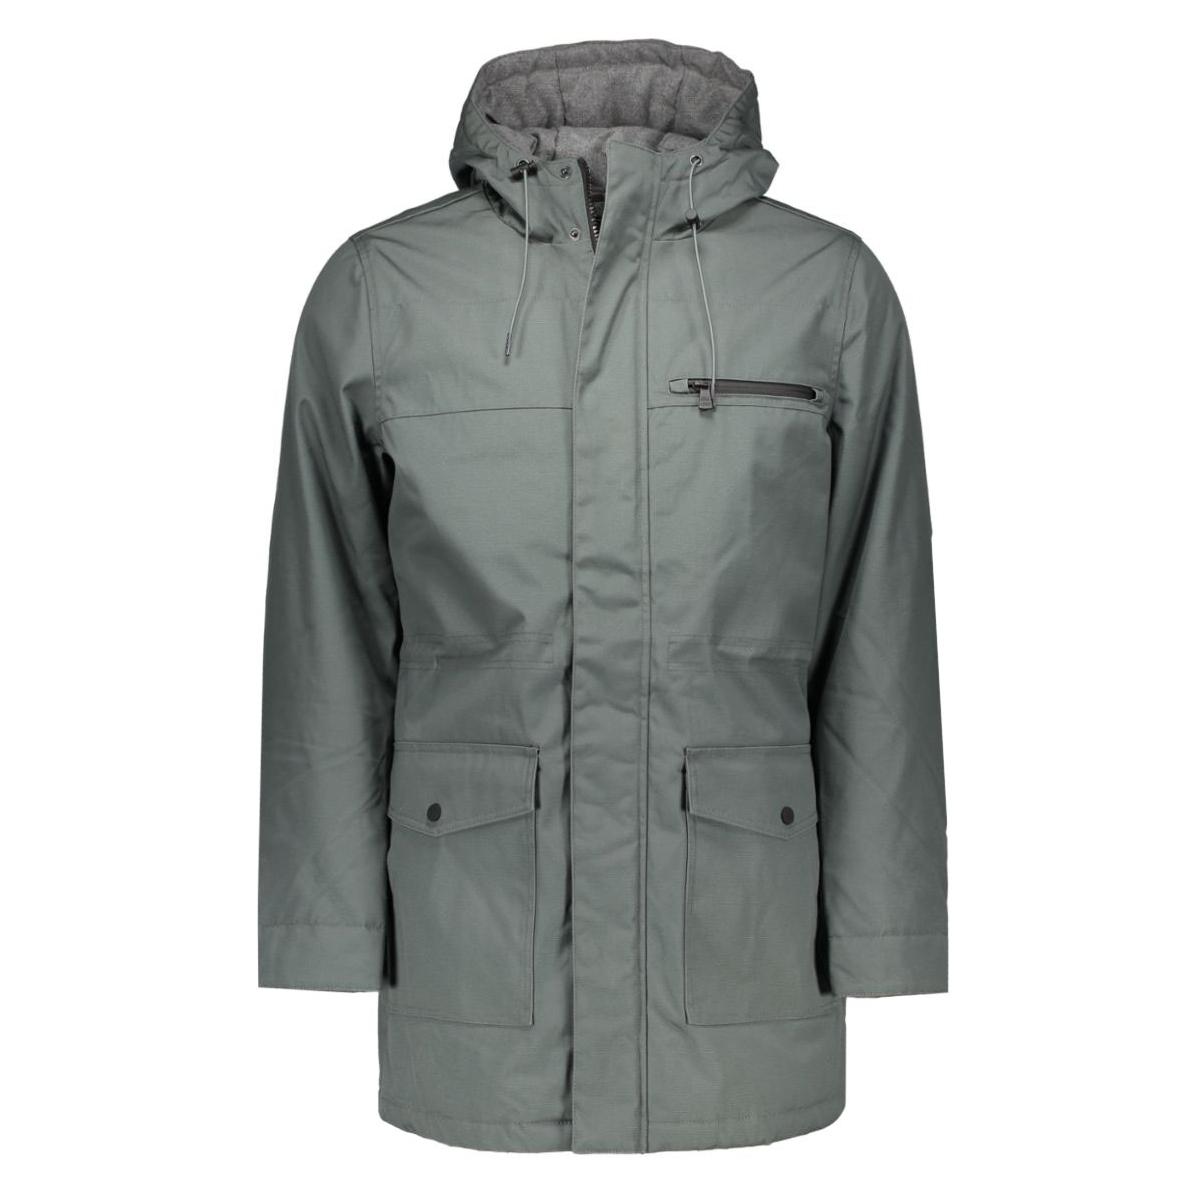 onsjohann jacket 22003876 only & sons jas urban chic